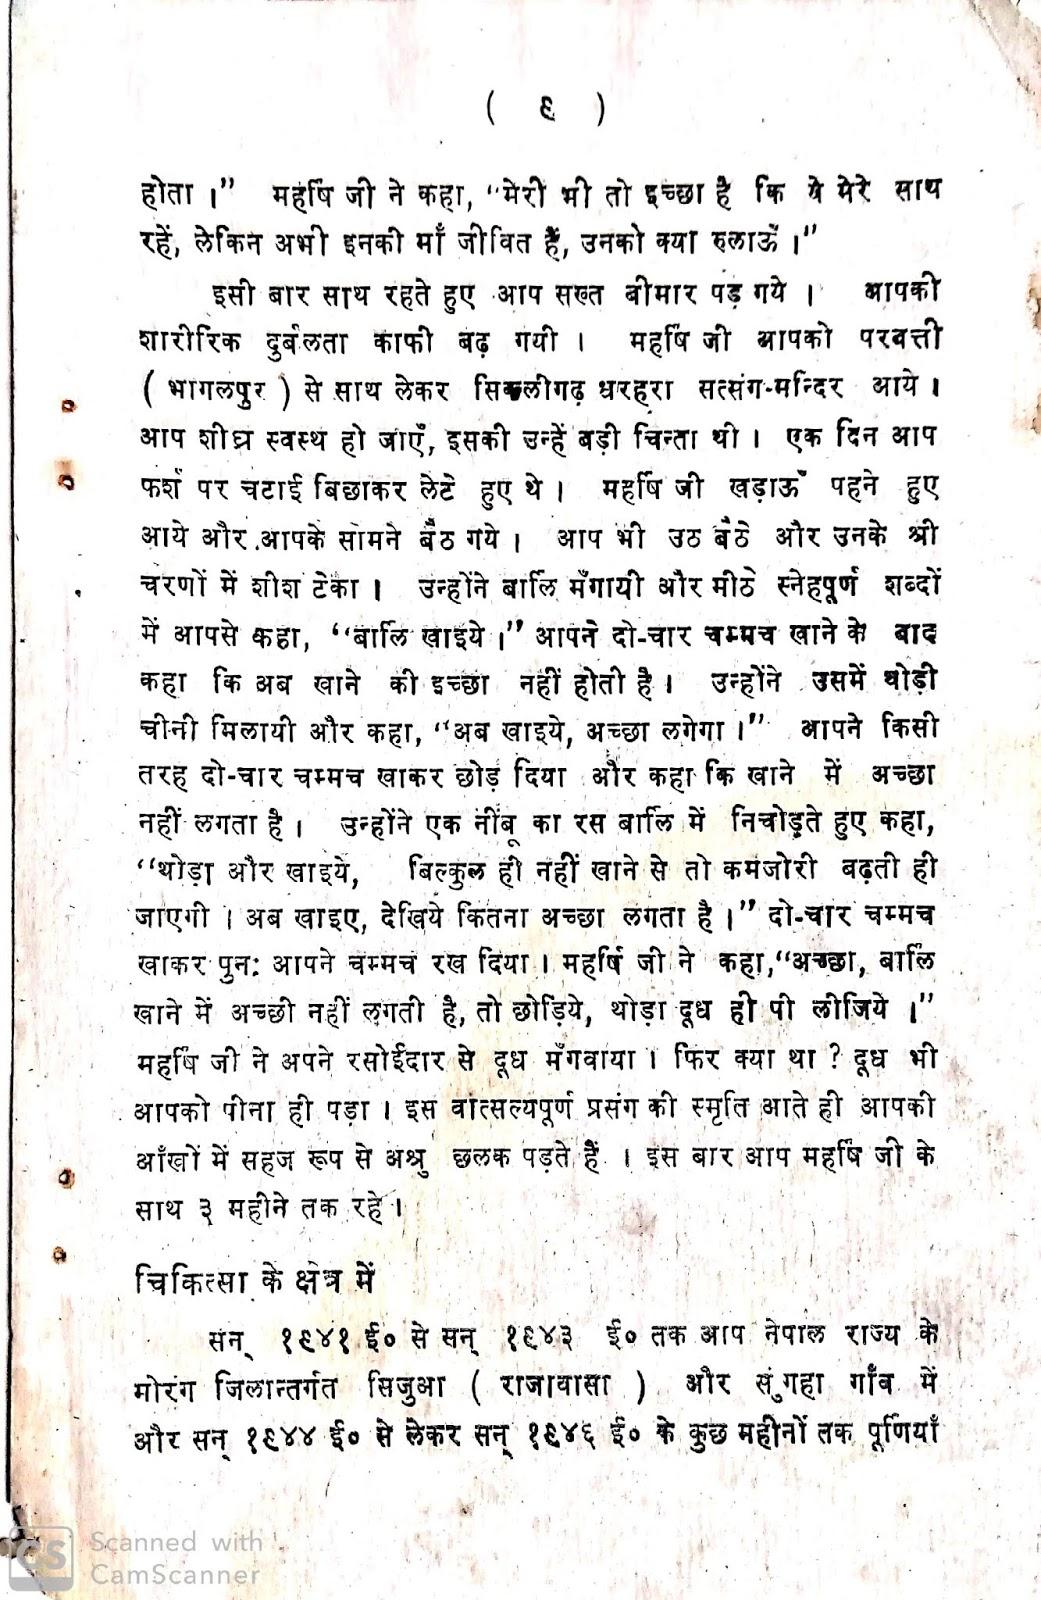 3 पूज्य पाद संतसेवी जी महाराज का परिचय। Brief introduction of Pujya Pad Santsevi Ji Maharaj। संतसेवी परिचय चित्र 9